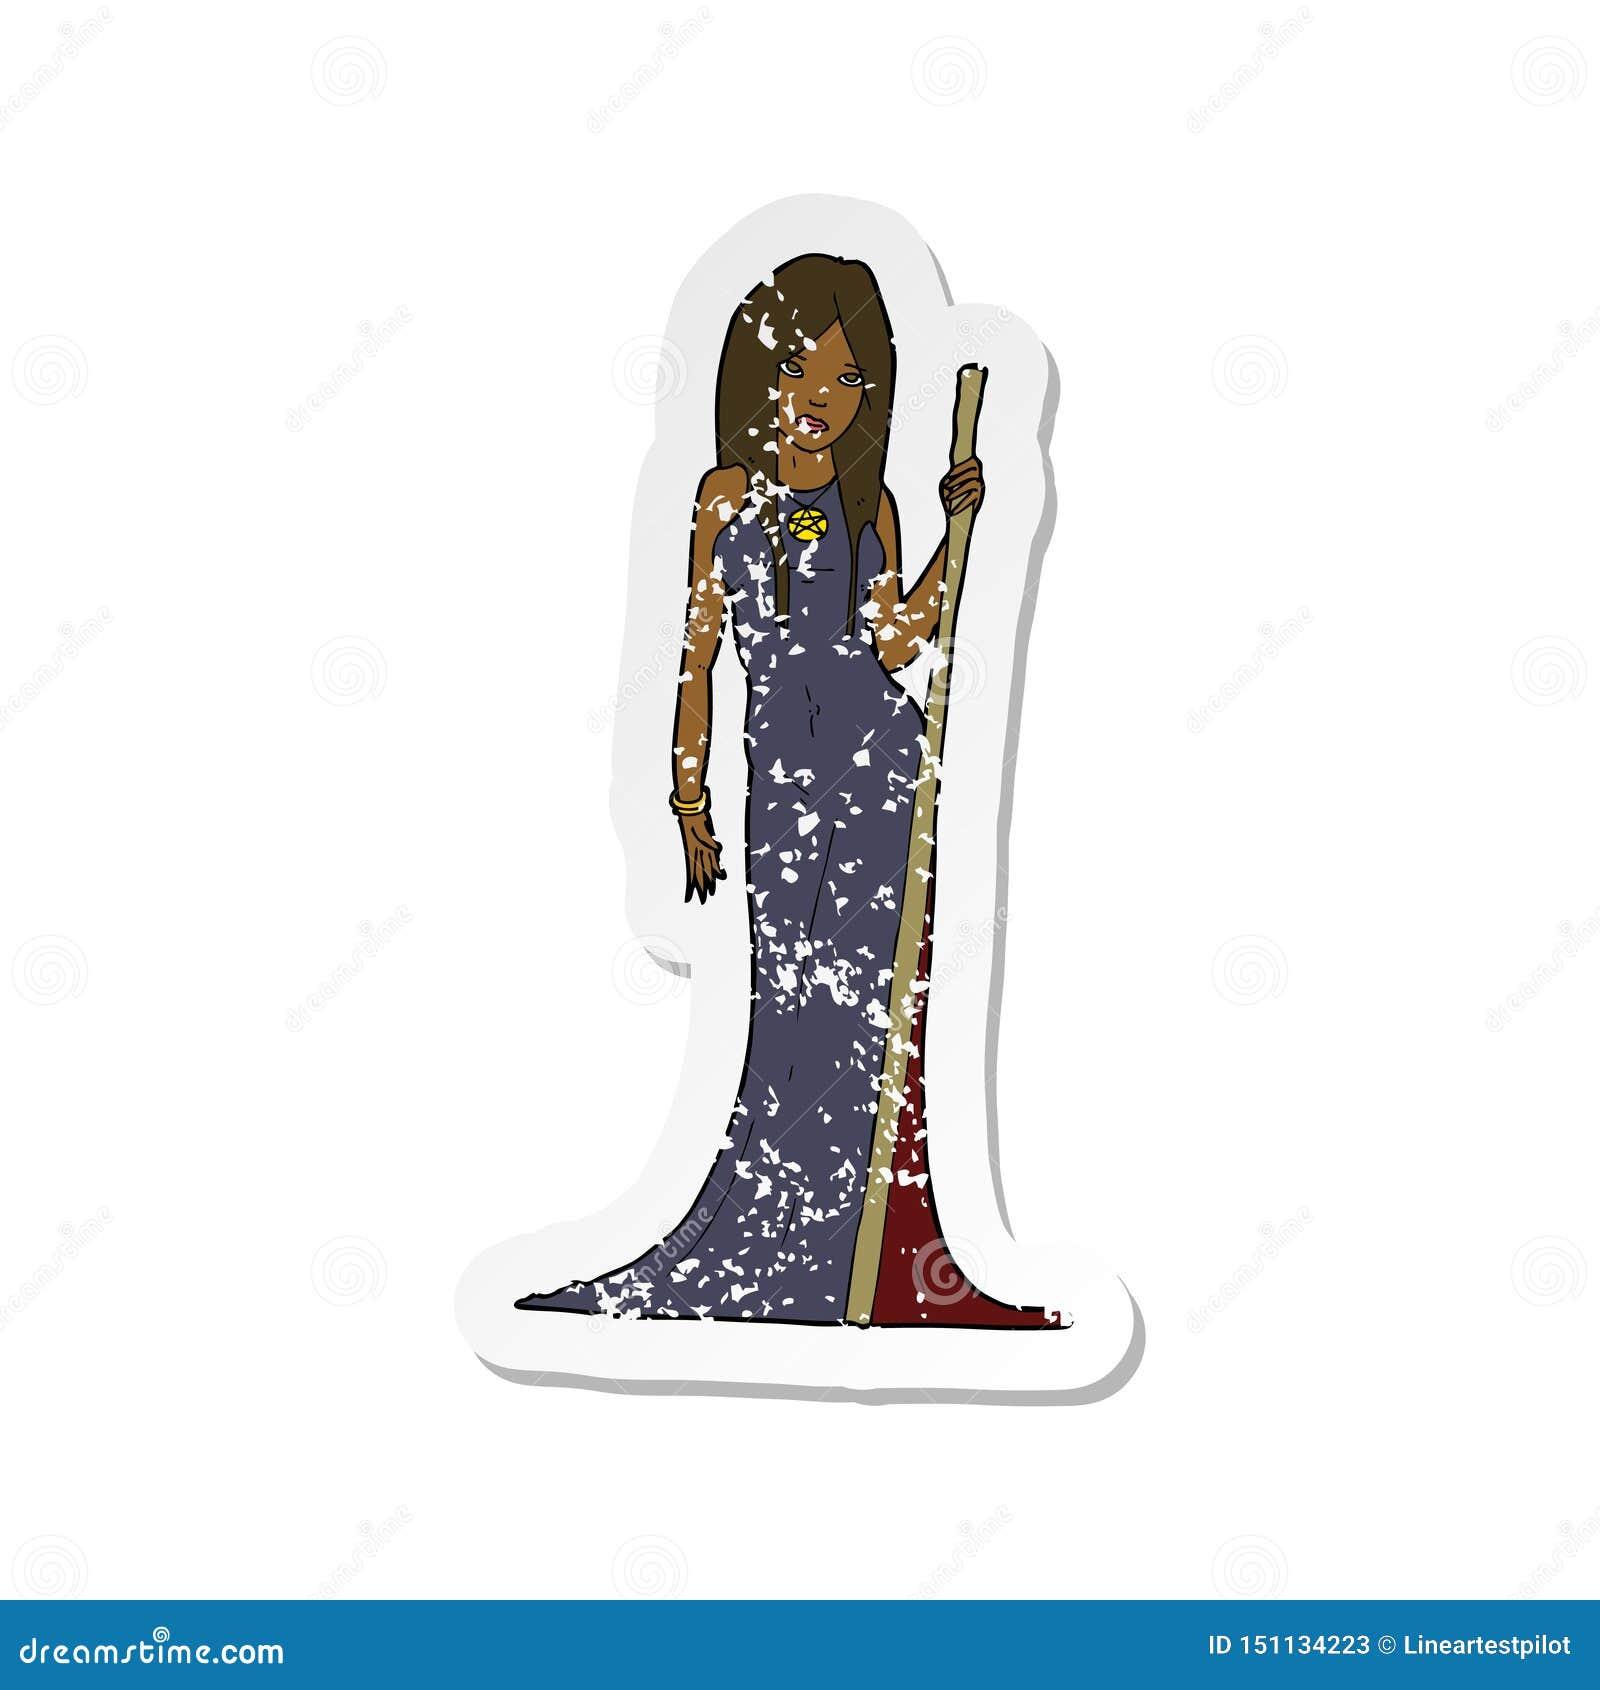 A creative retro distressed sticker of a cartoon sorceress